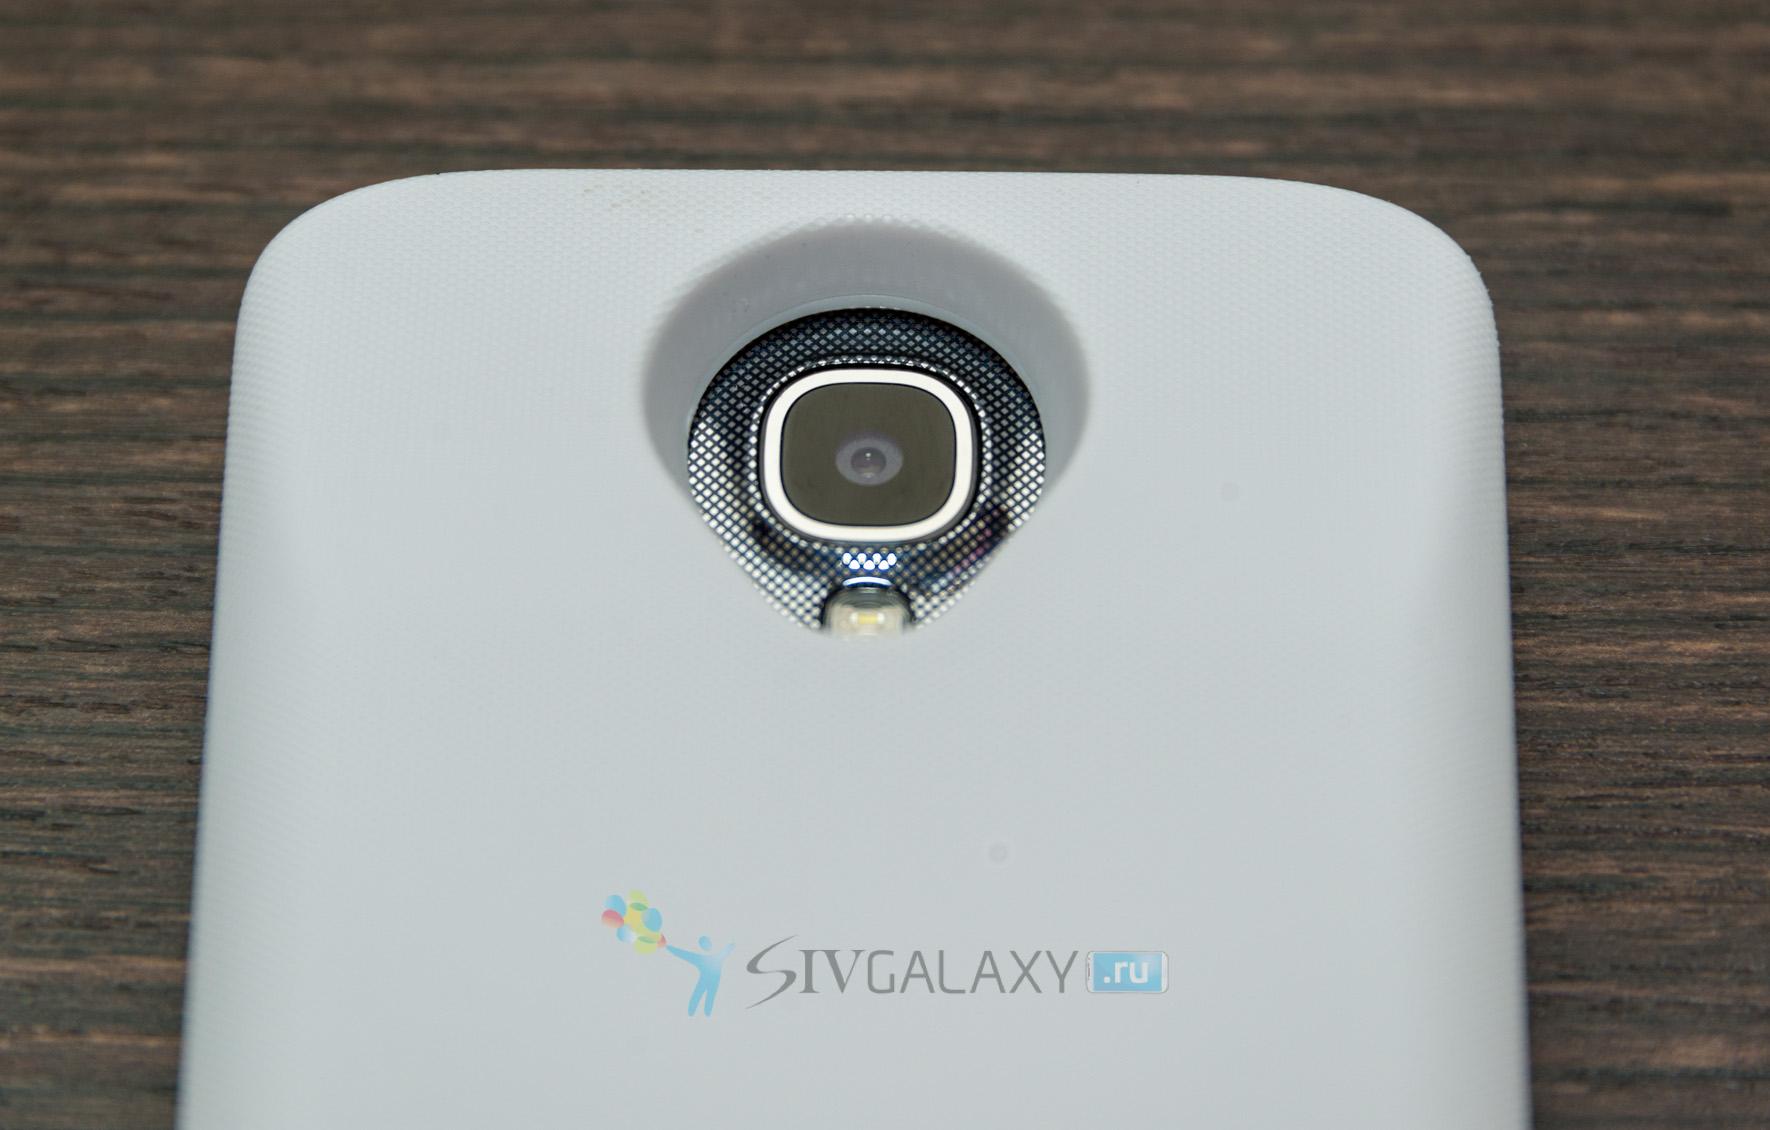 Кейс с аккумулятором на Galaxy S4